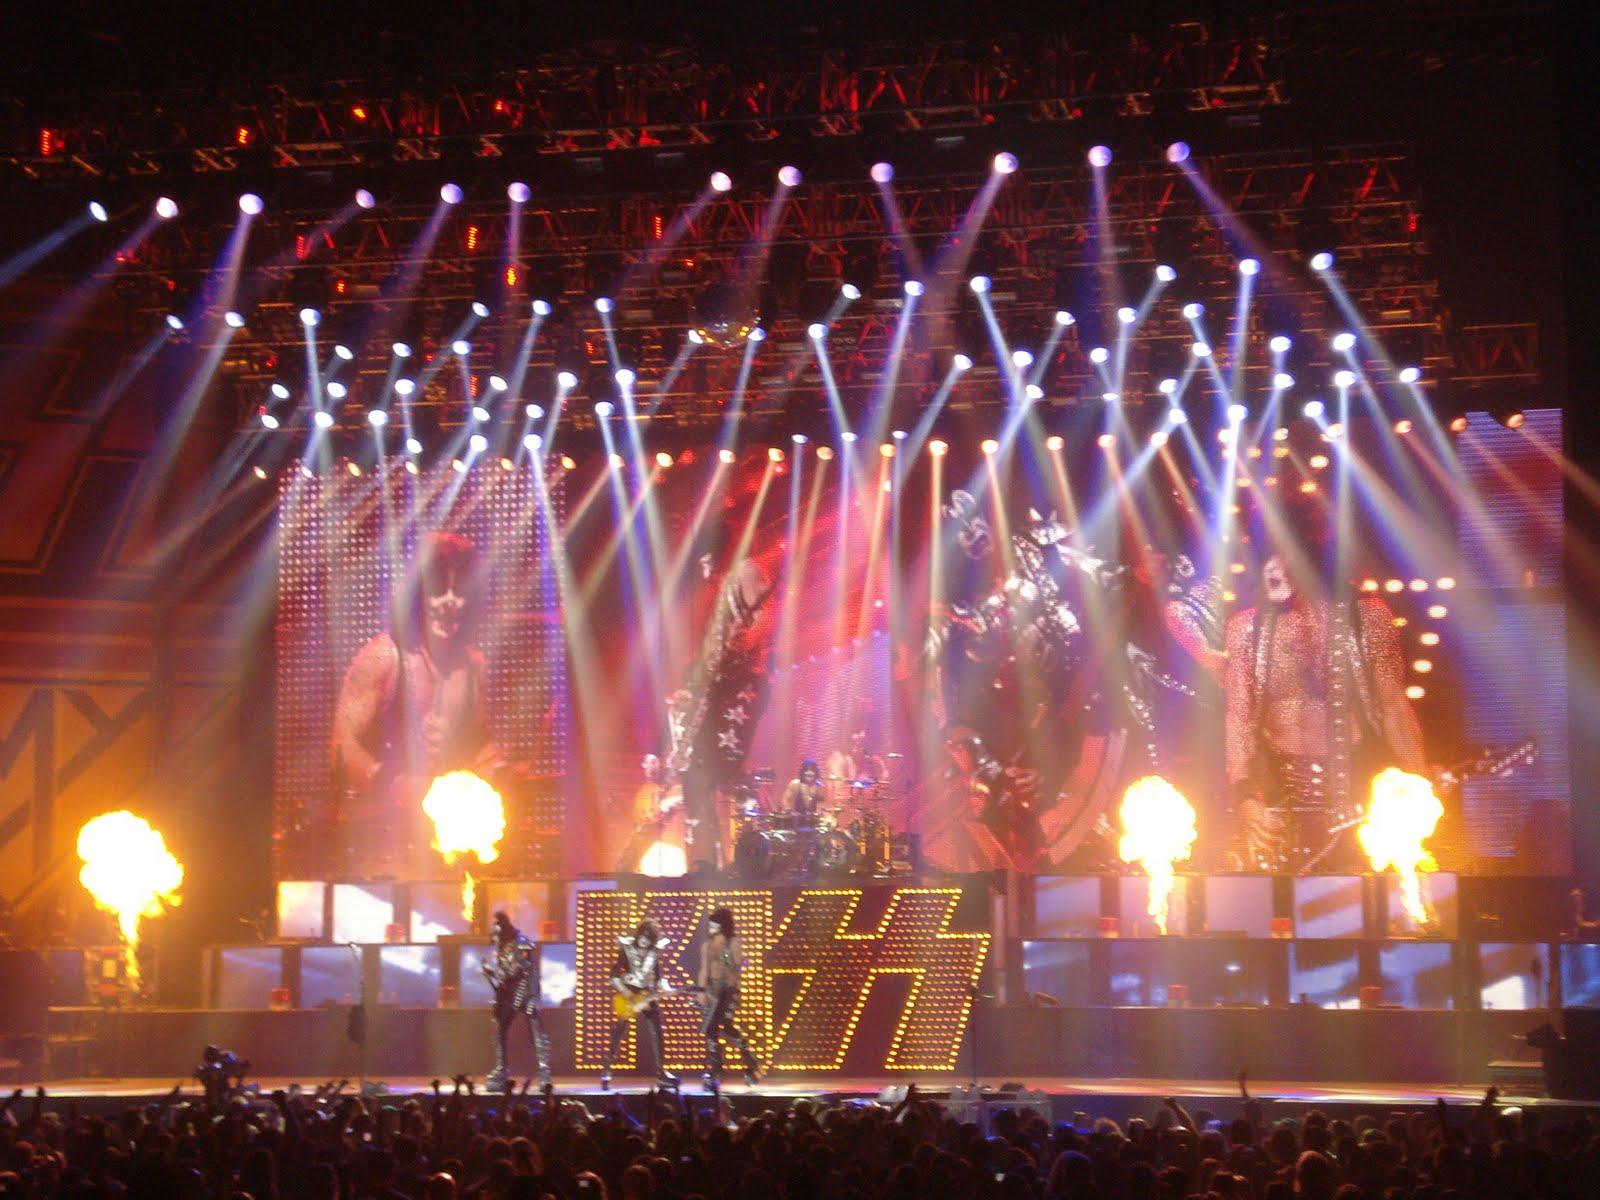 Kiss heavy metal rock bands concert crowd d wallpaper background 1600x1200